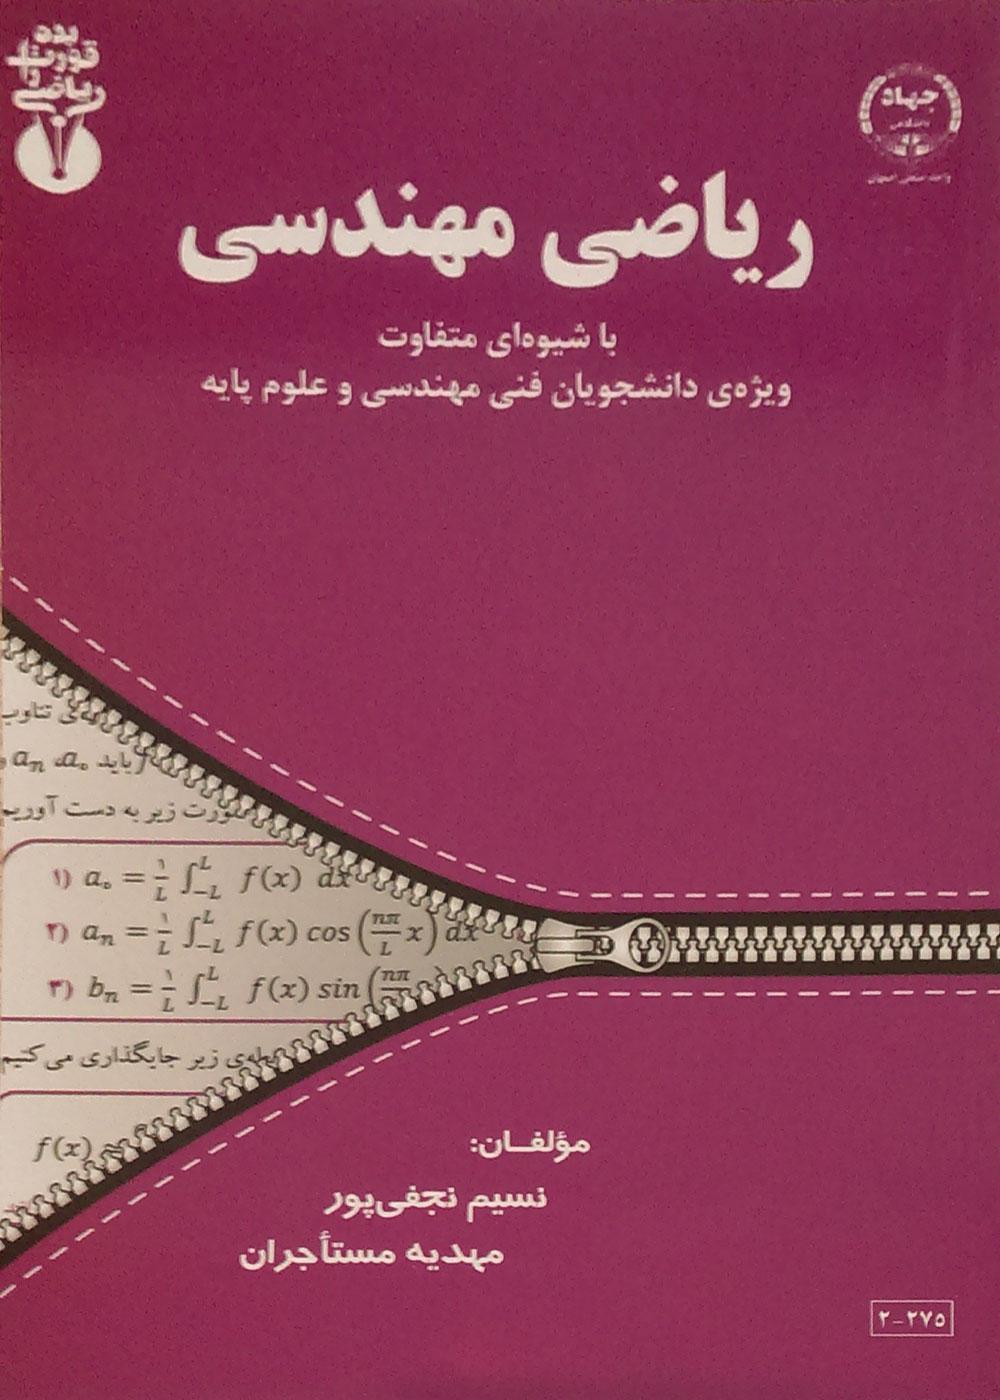 Engineering_Math_Hasim_Najafipour